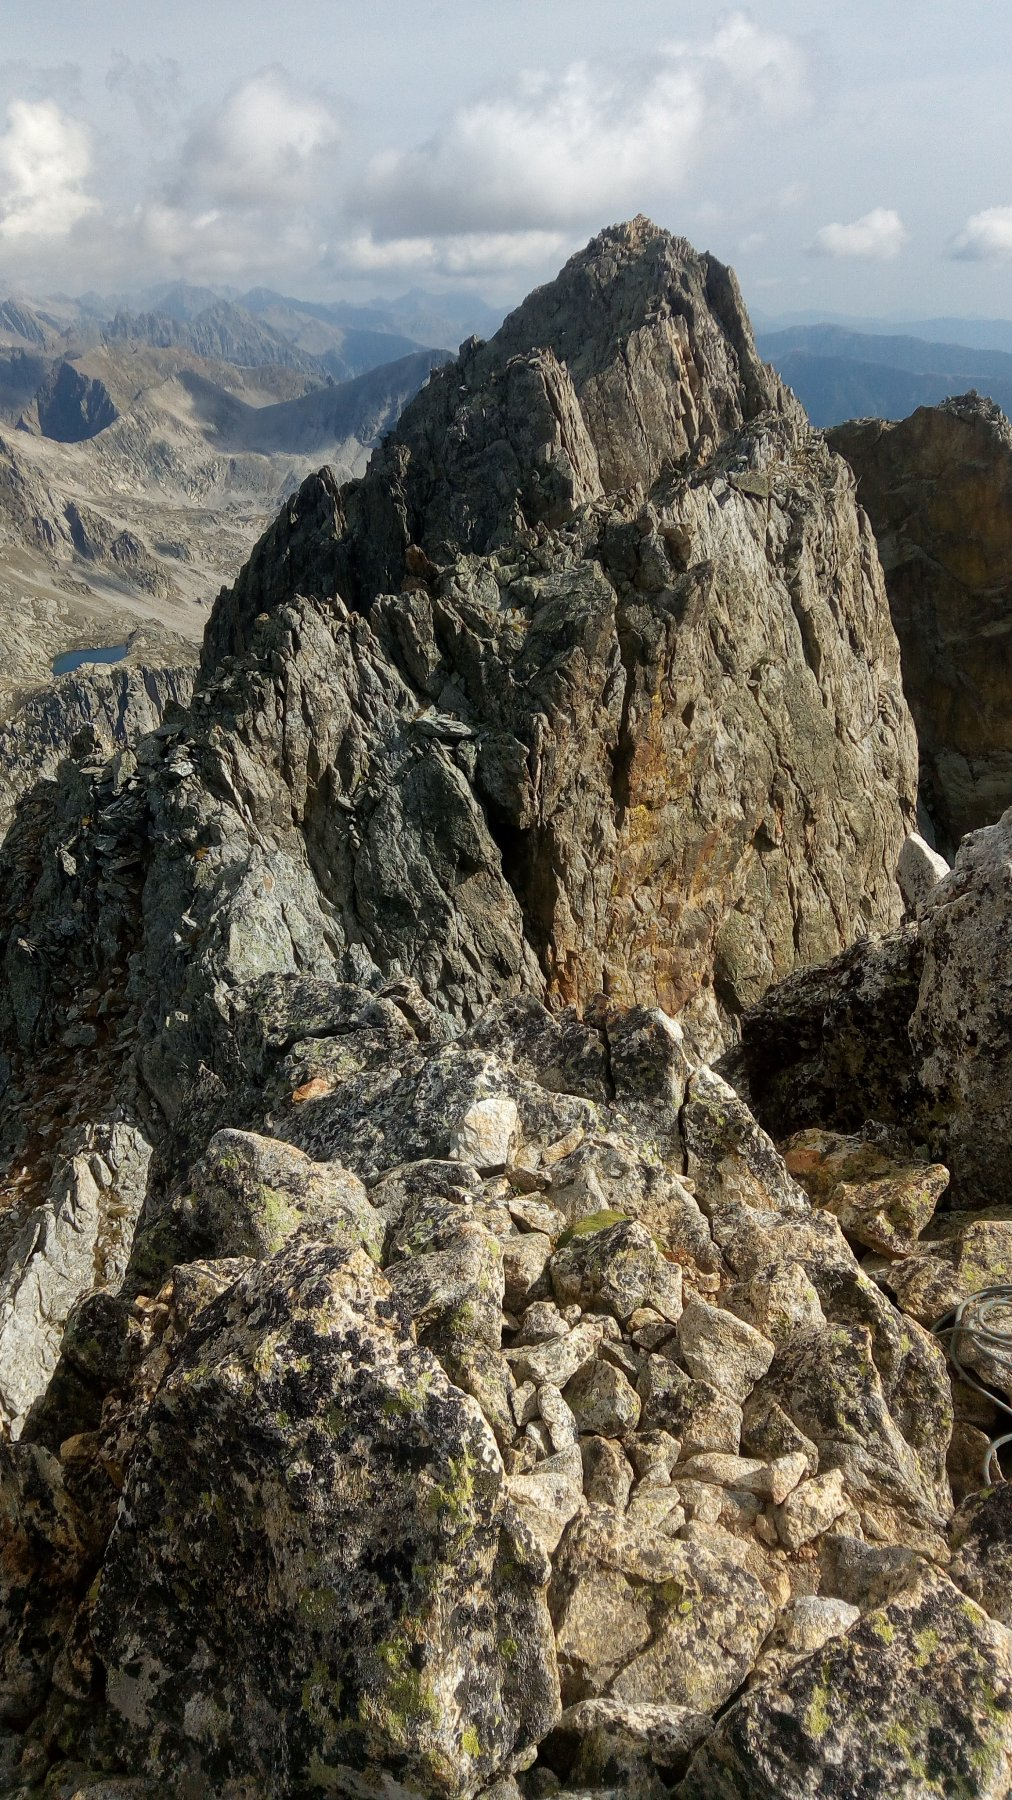 La cresta sommitale del Giegn